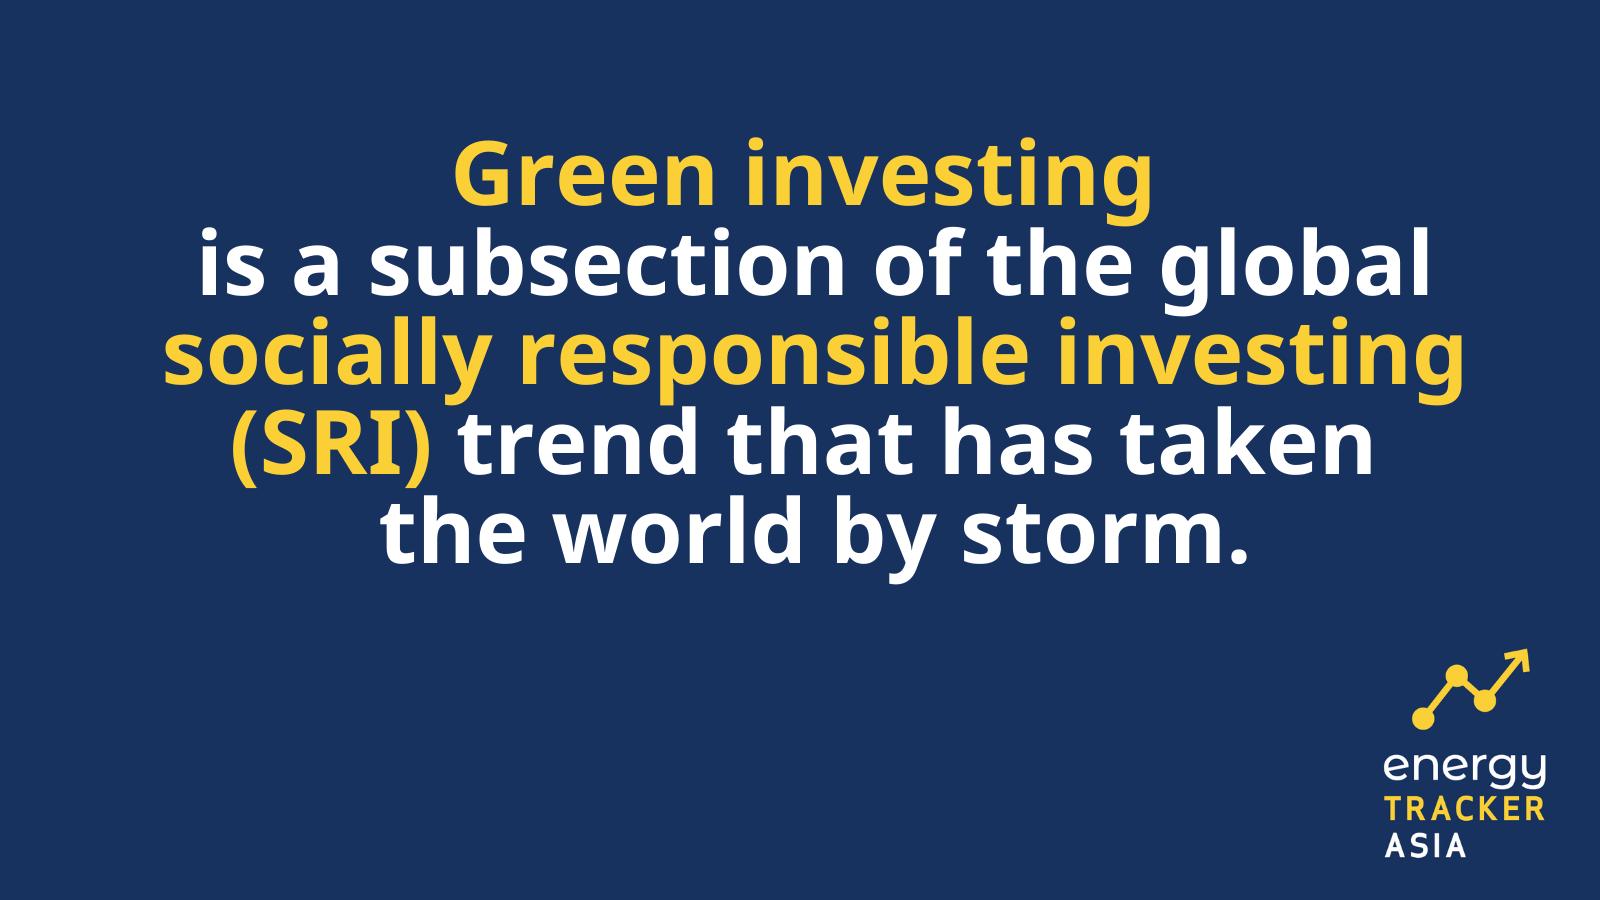 renewable energy, renewable energy investment, clean energy investment, clean energy financing, green energy investments